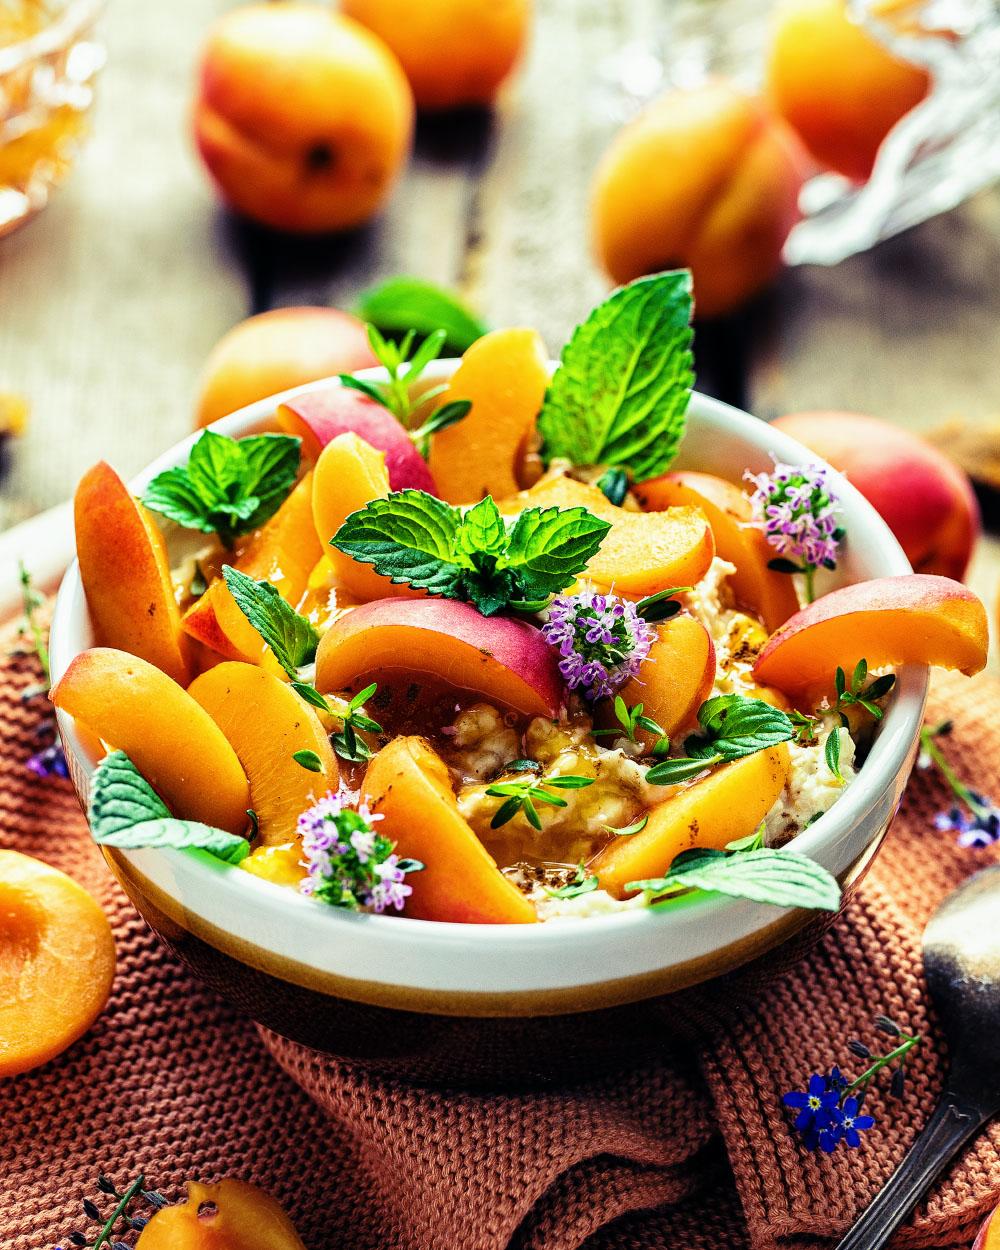 Aprikosen-Oatmeal-Bowl einfaches Rezept für perfektes Sommerfruehstueck